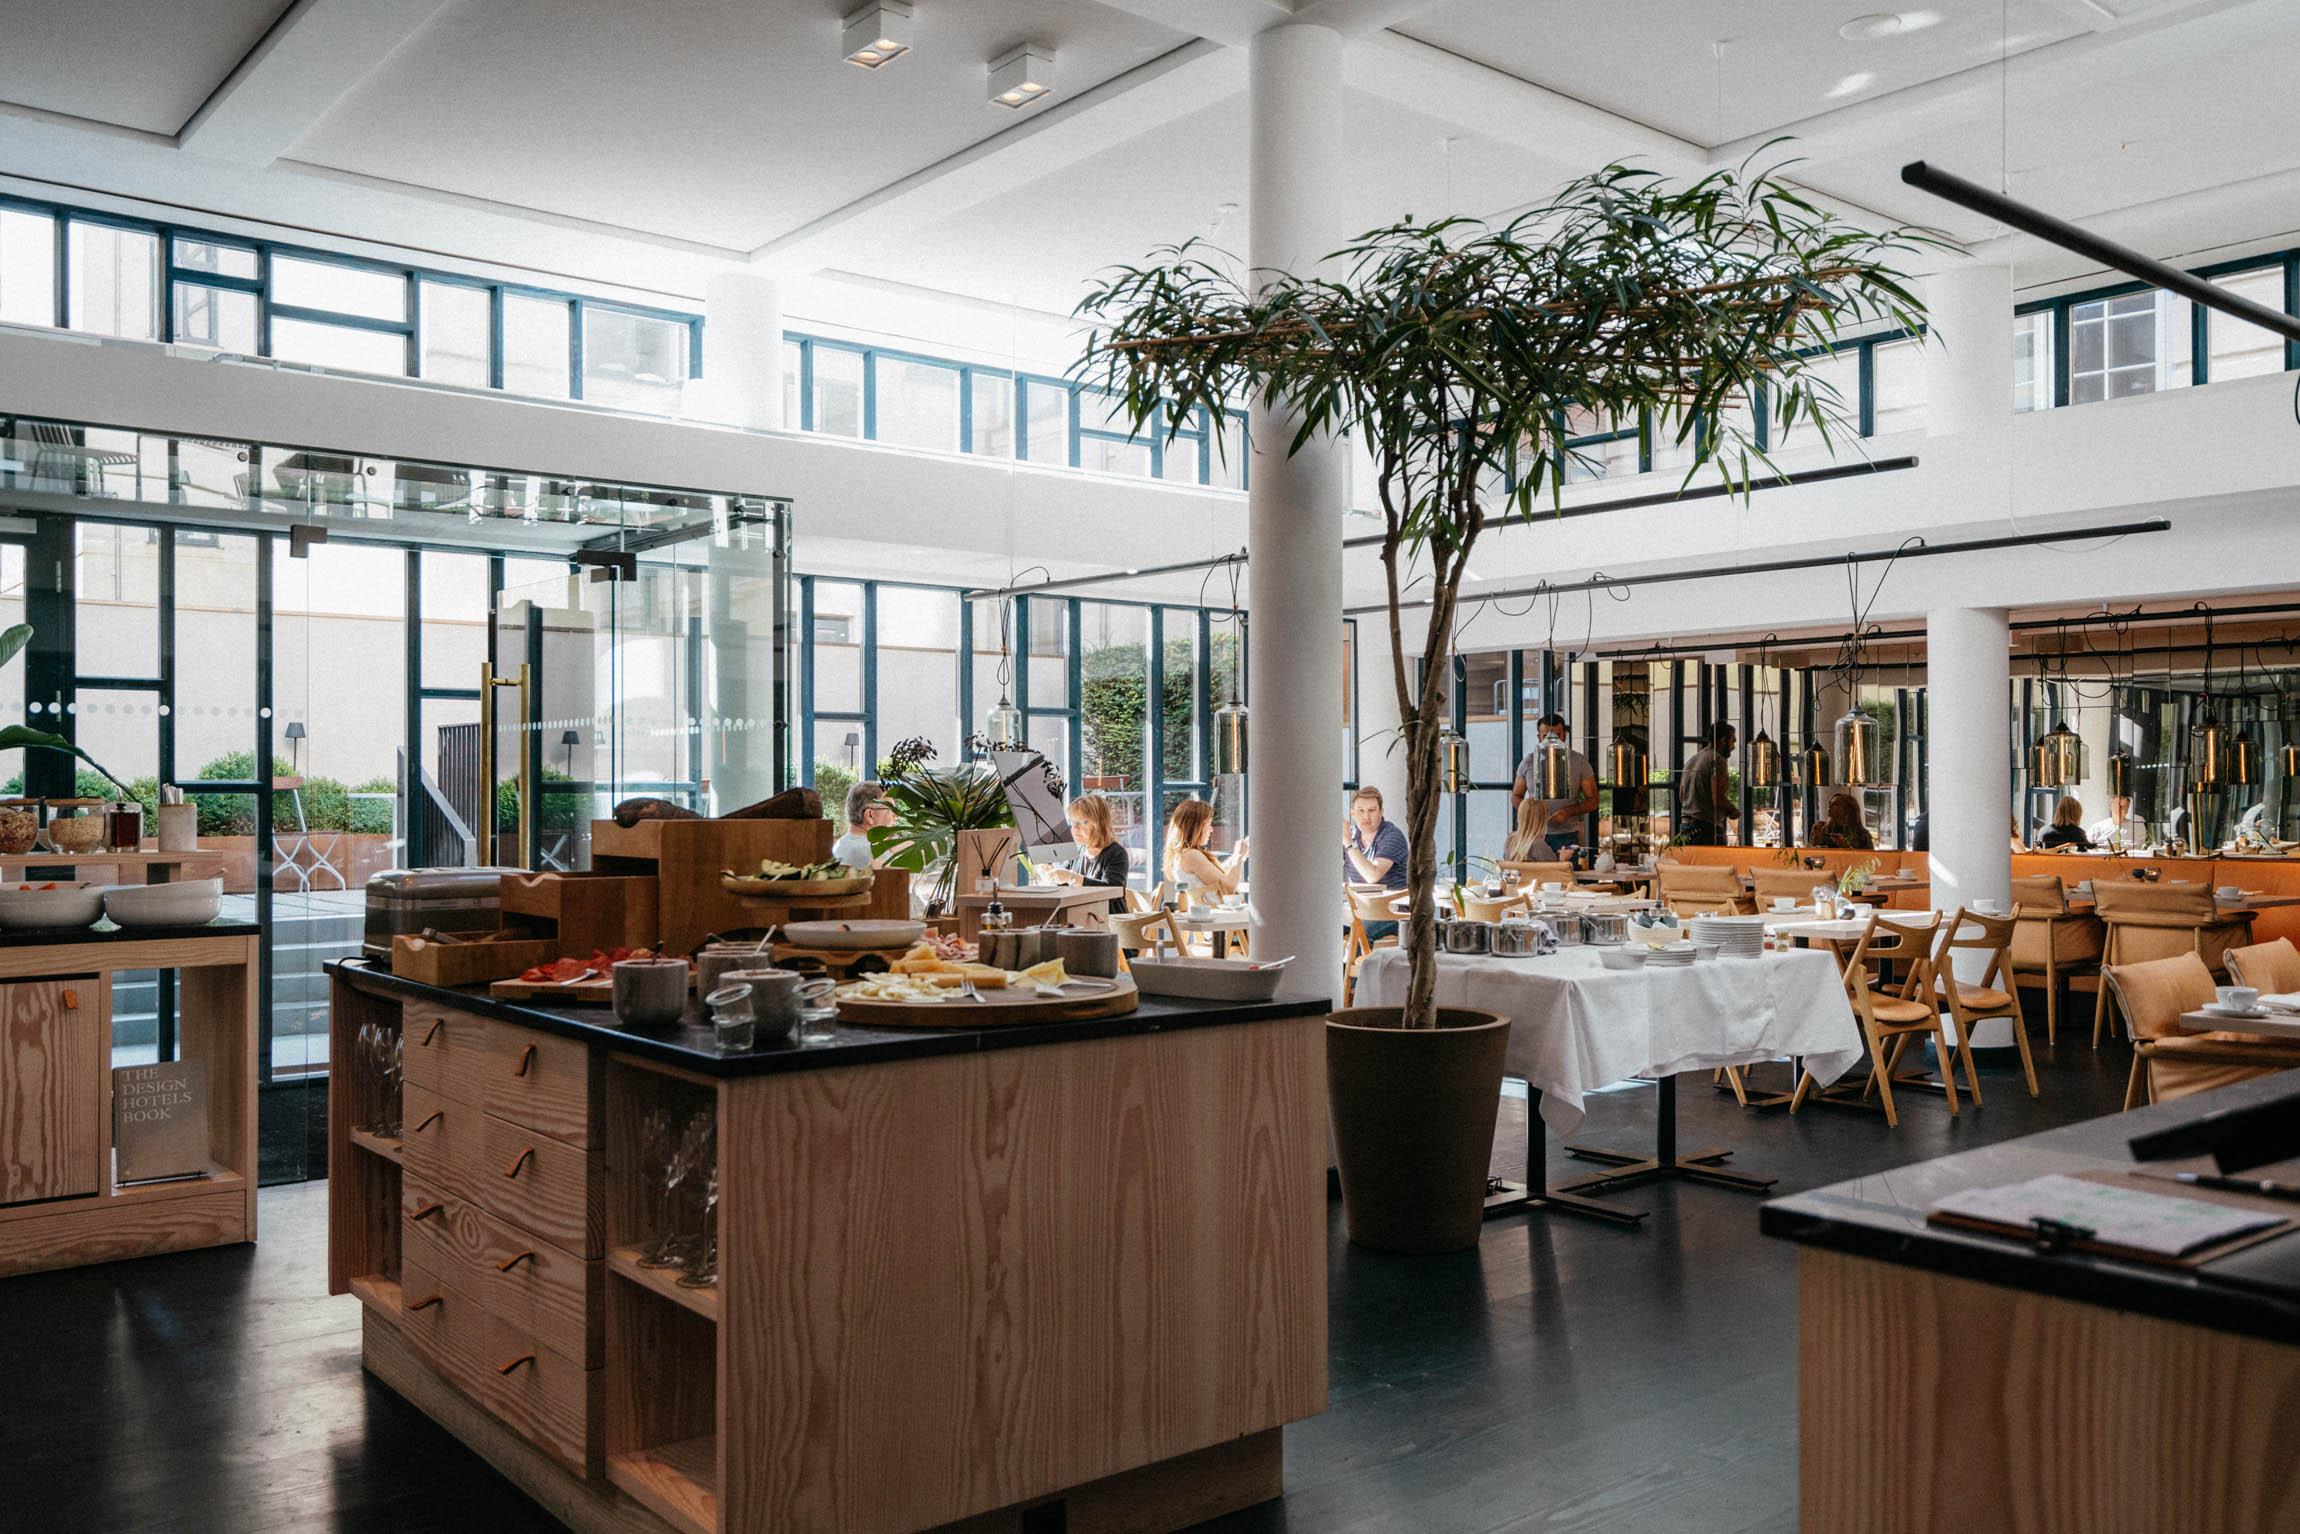 Daily breakfast in the  Nobis Hotel Copenhagen  kitchen